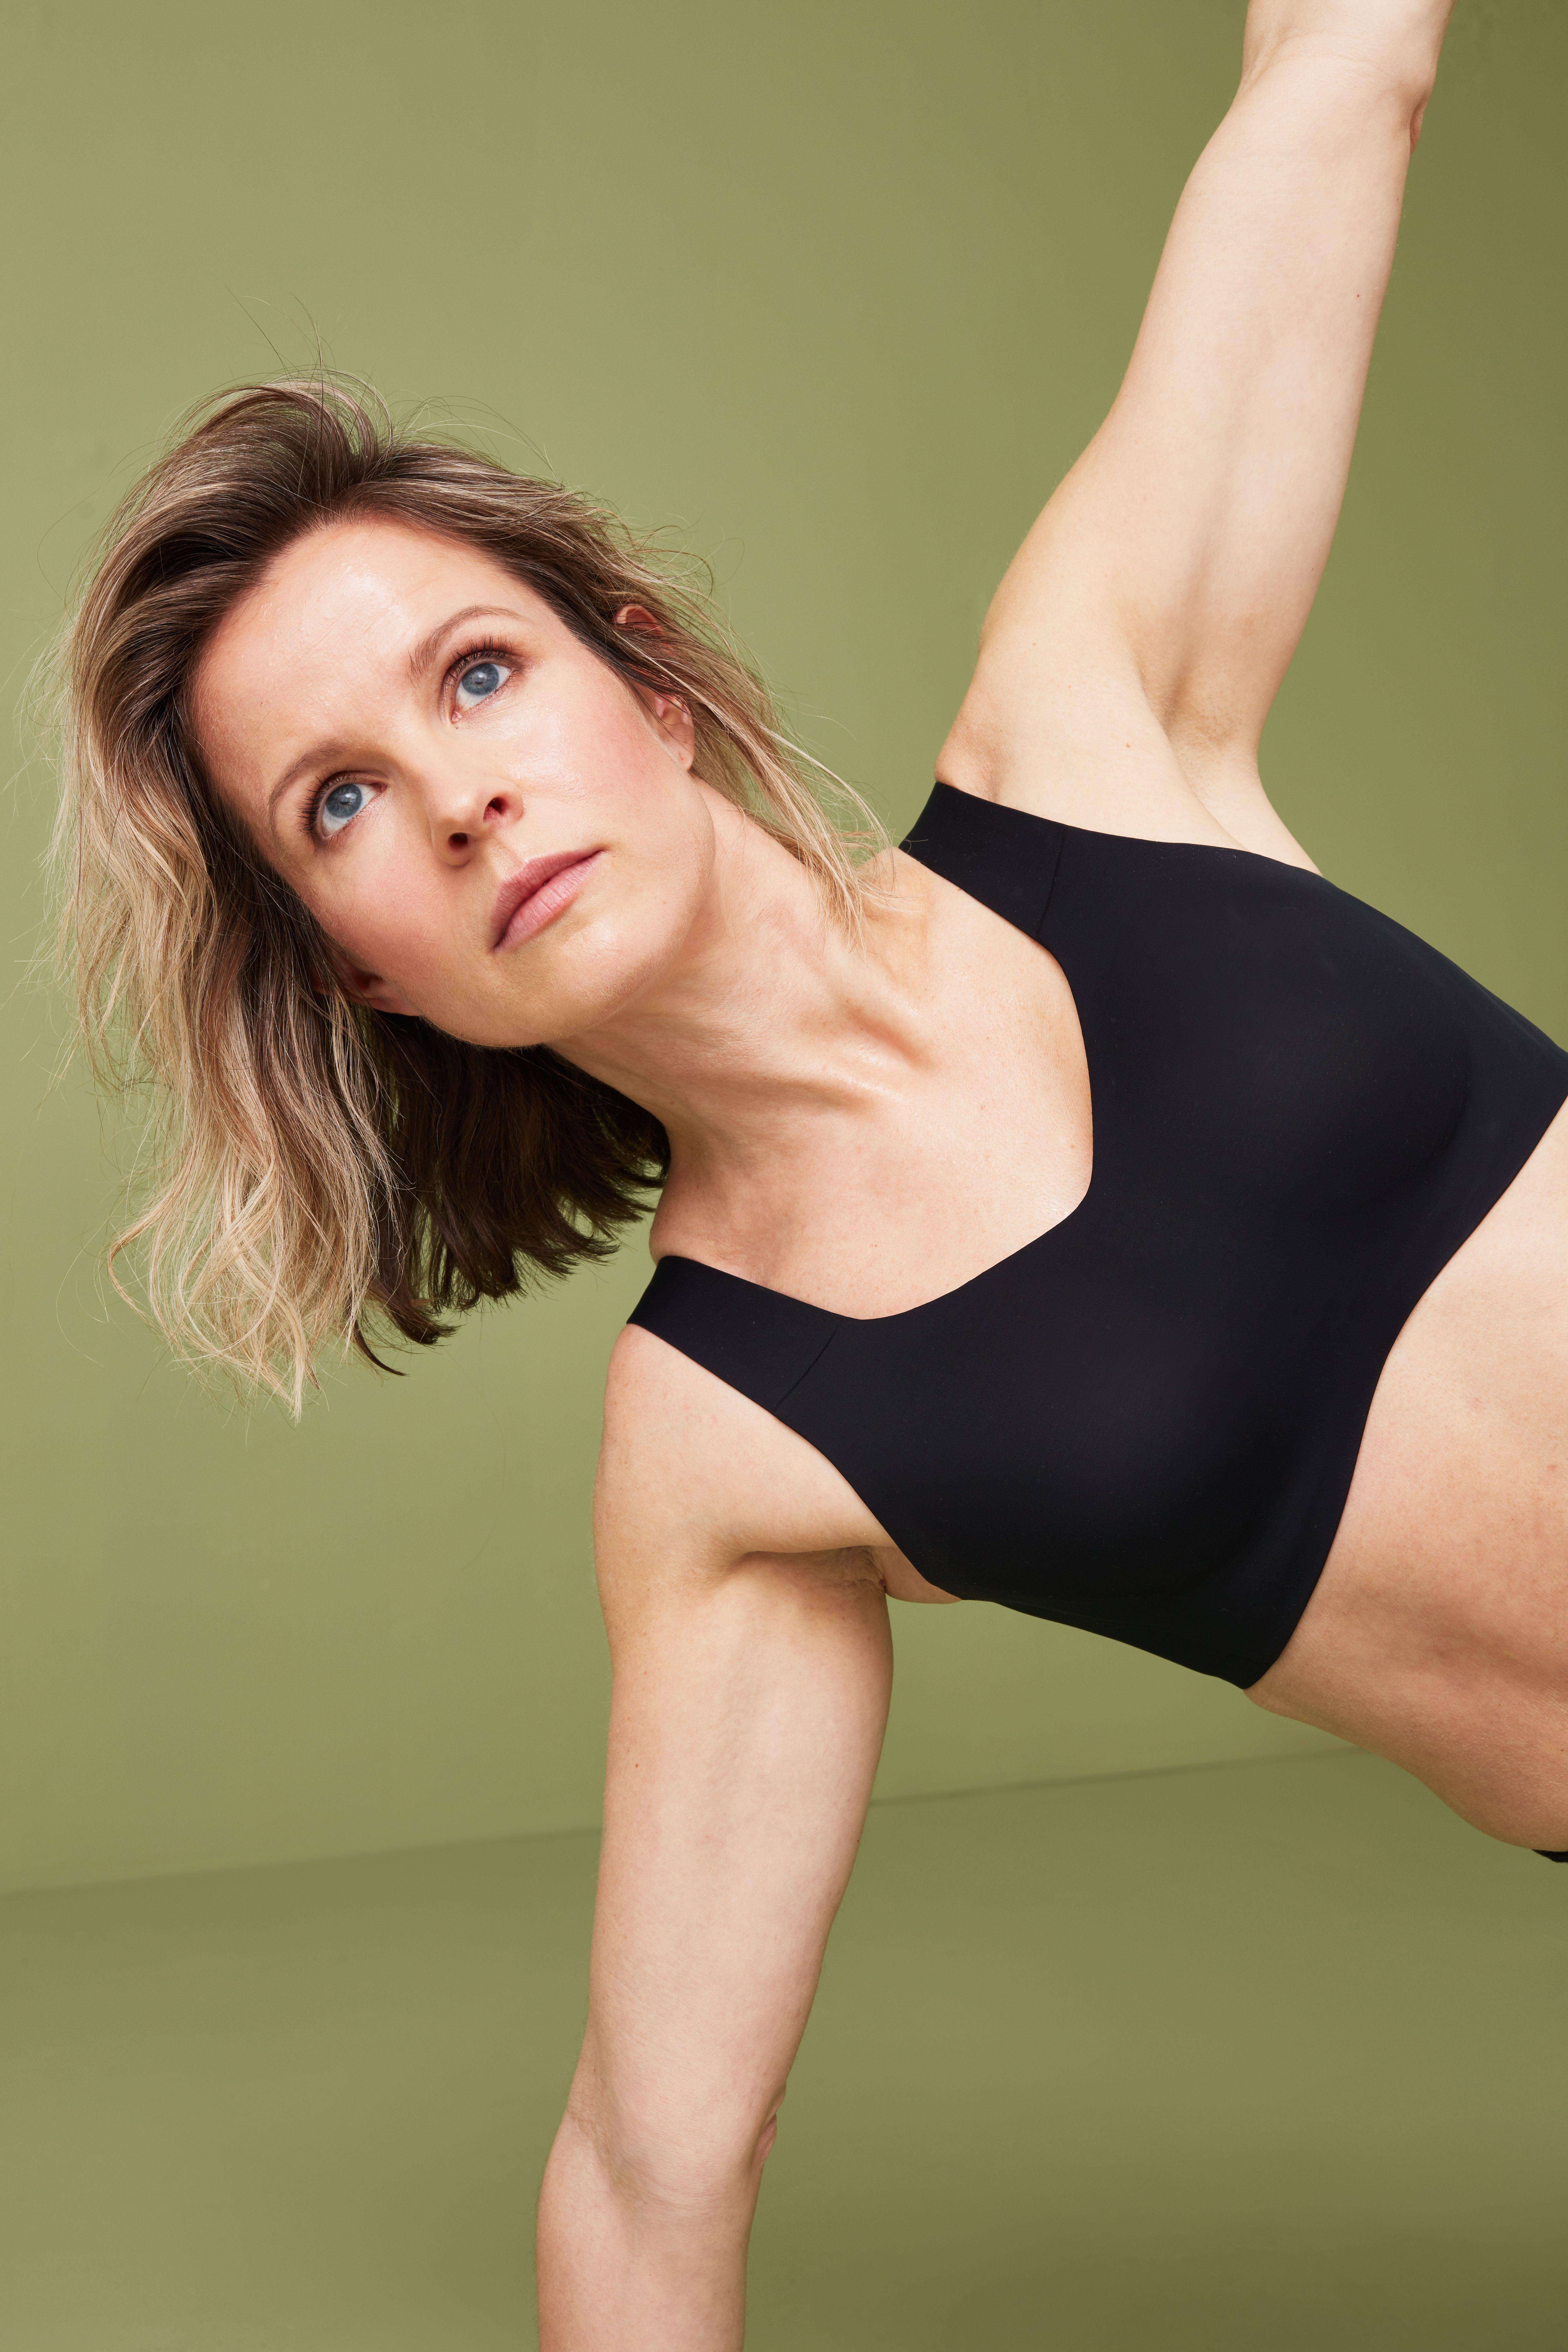 Catalyst Sports Bra Sports bra, High impact sports bra